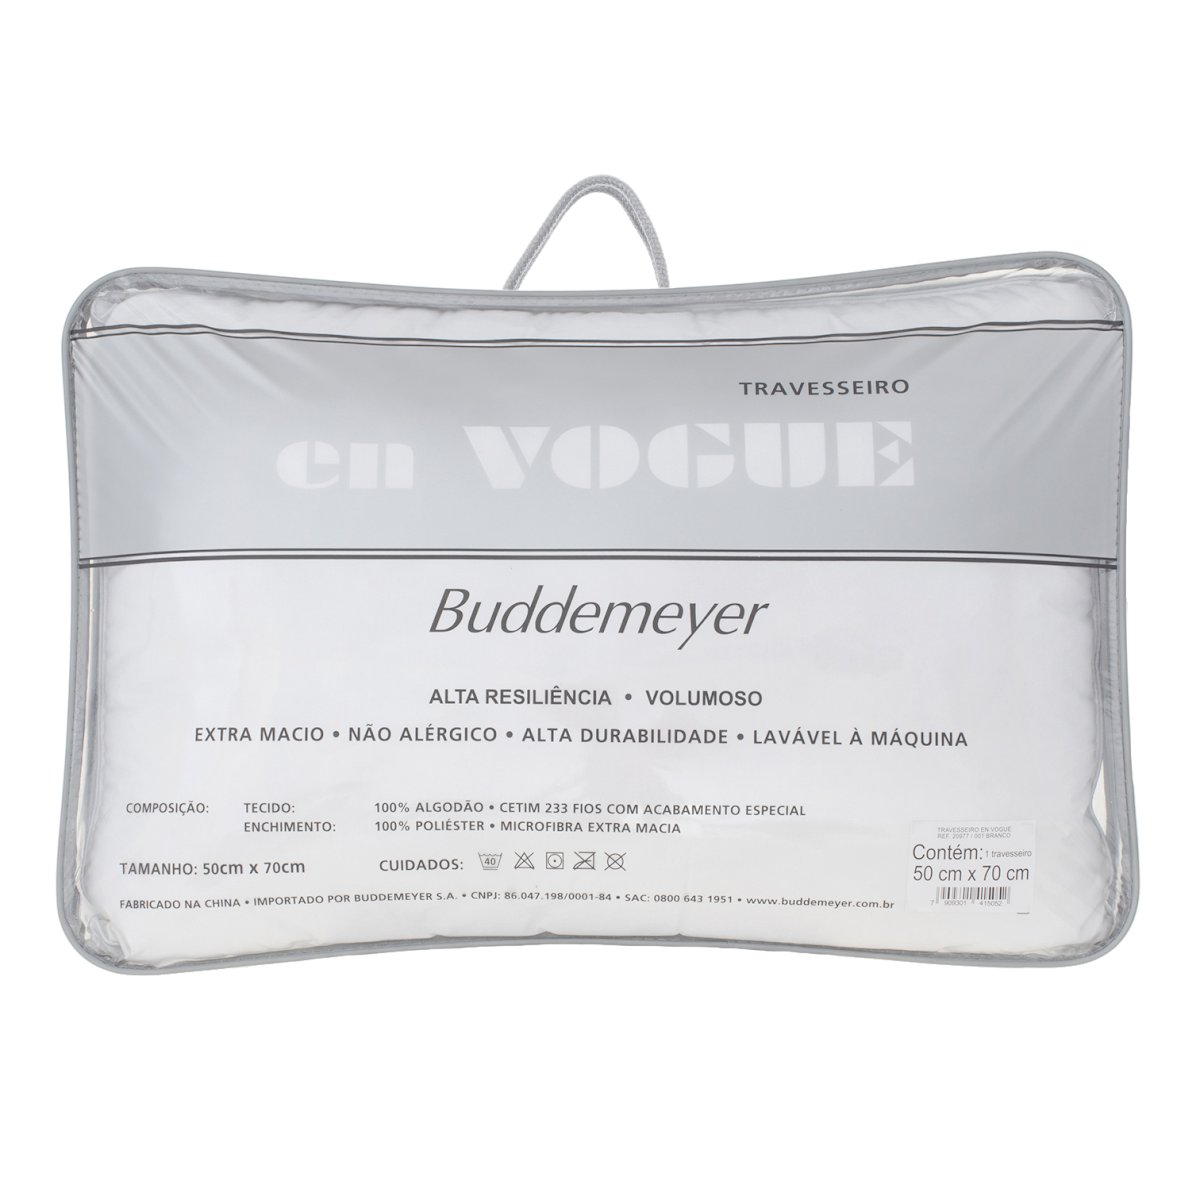 Travesseiro En Vogue Cetim 233 Fios Buddemeyer